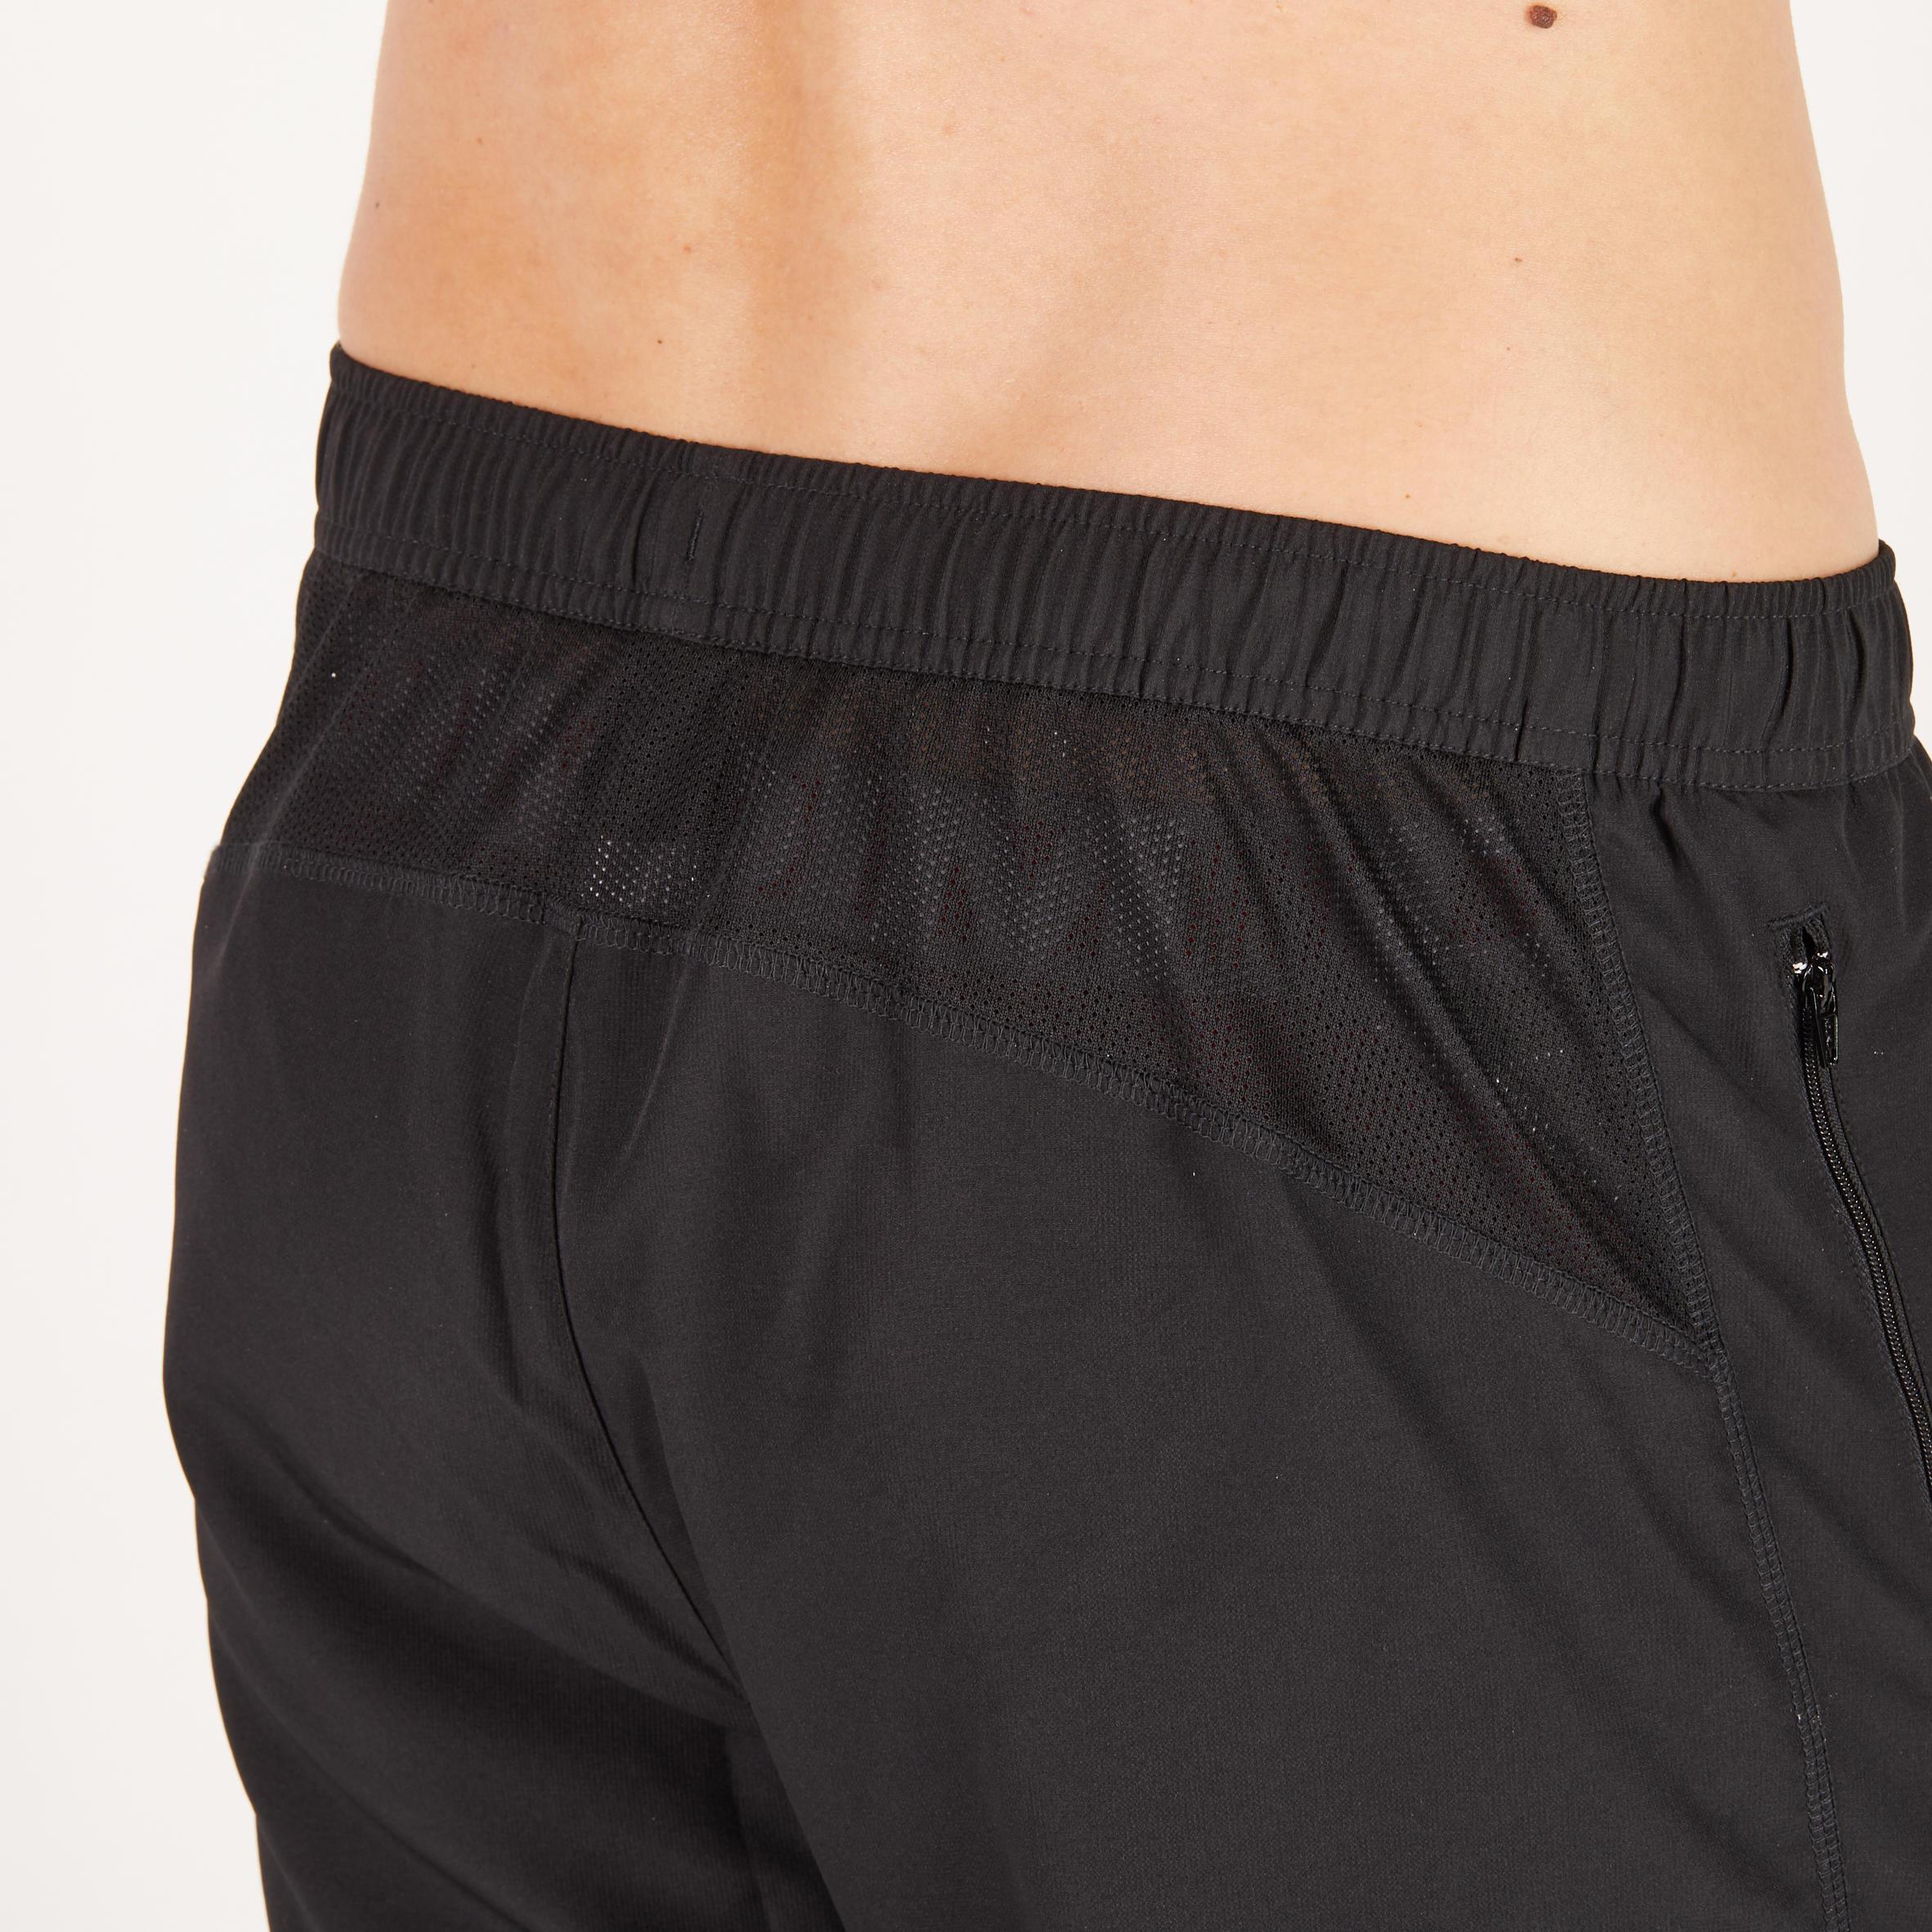 FPA120 Cardio Fitness Bottoms - Black